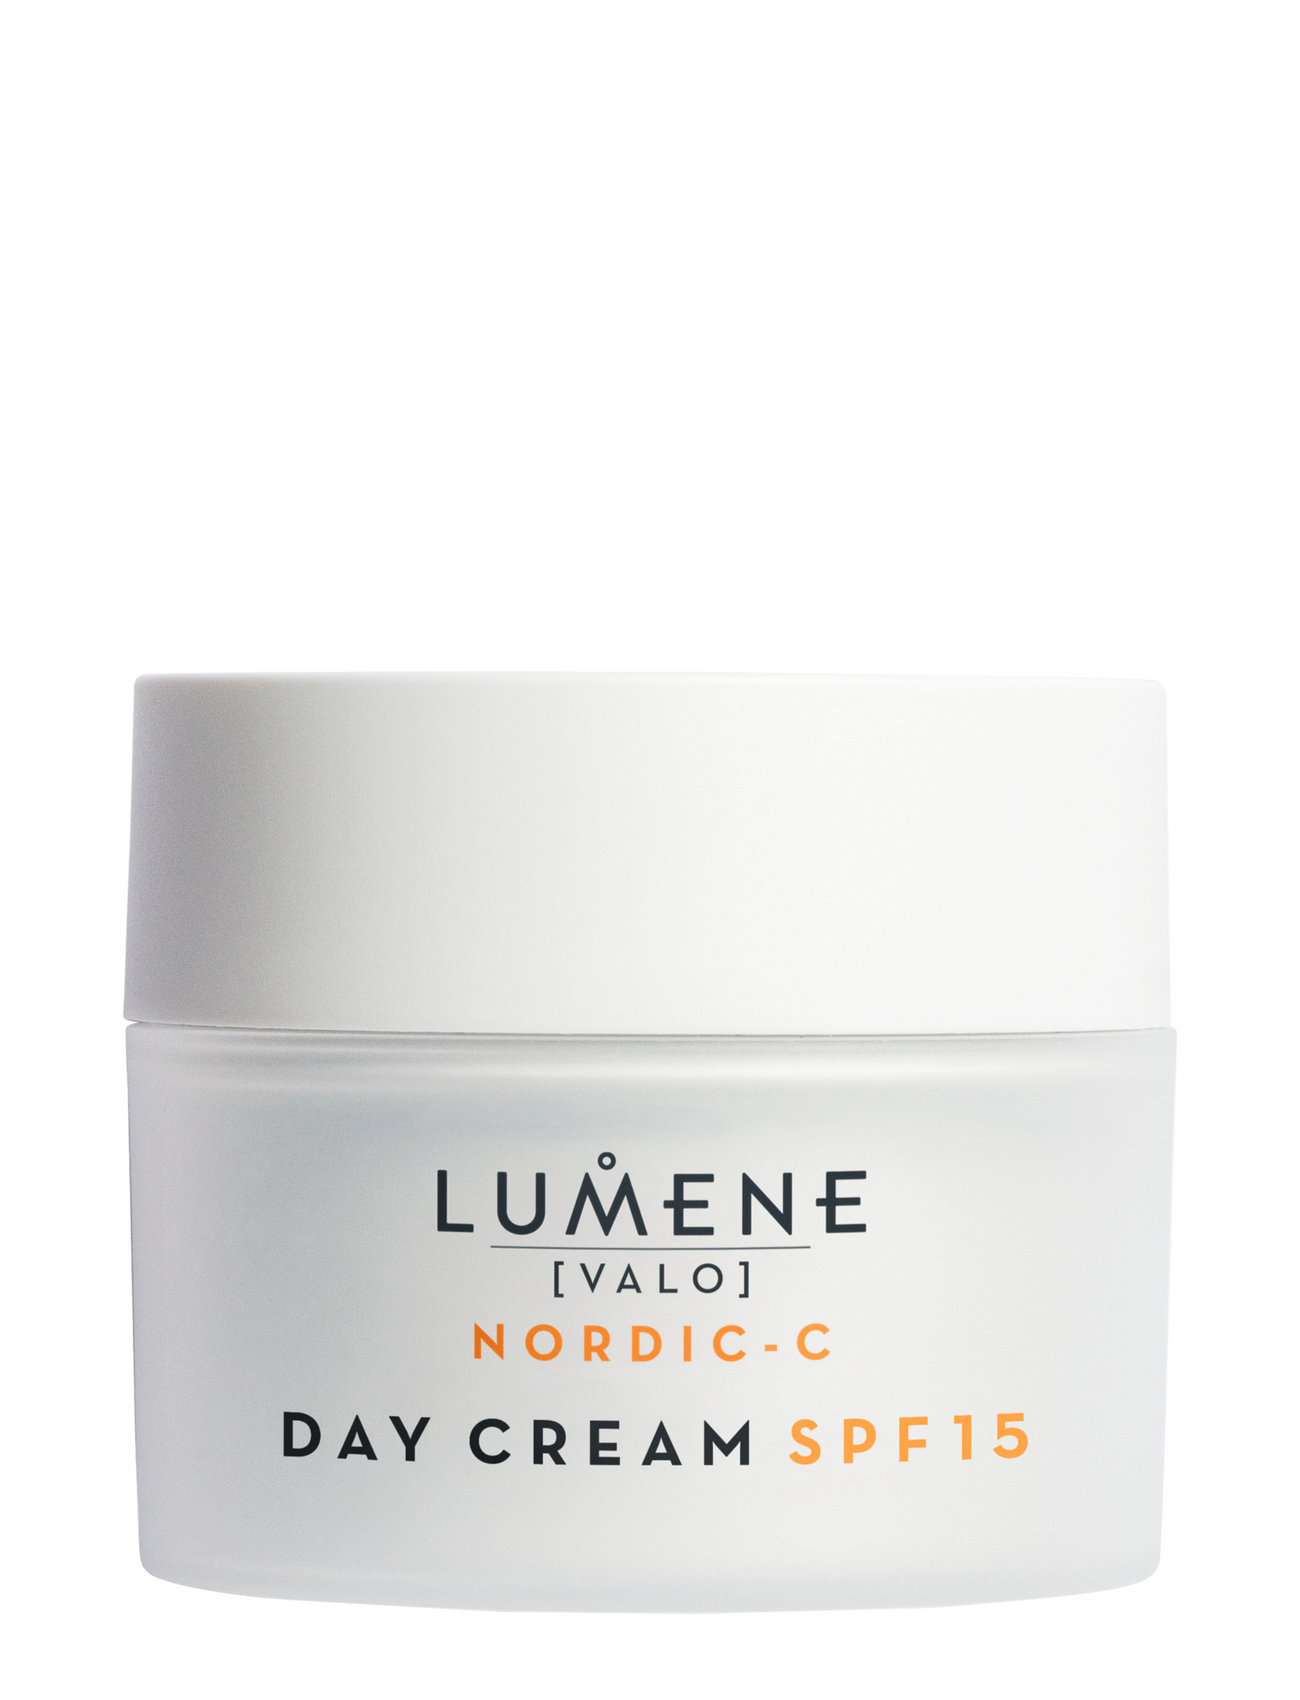 Image of Valo Nordic-C Day Cream Spf 15 Beauty WOMEN Skin Care Face Day Creams Nude LUMENE (3075042523)